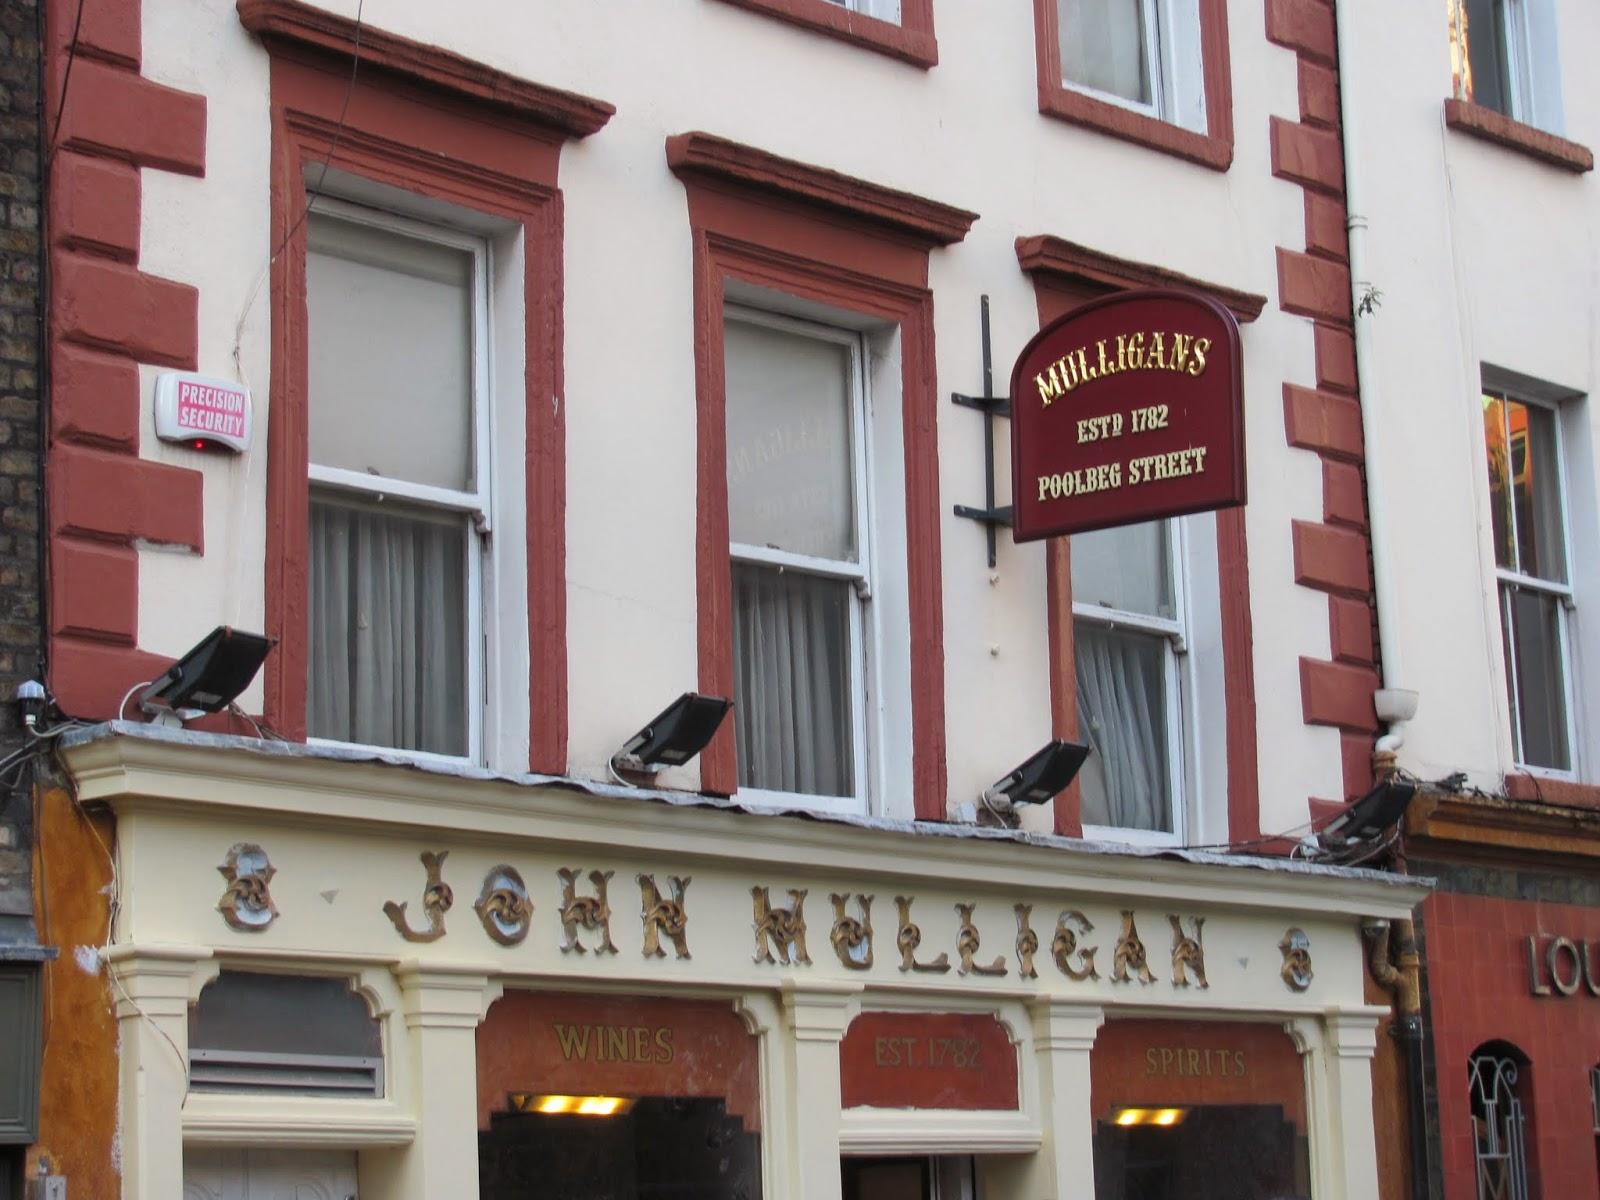 Mulligan's Exterior Poolbeg Street Dublin, Ireland